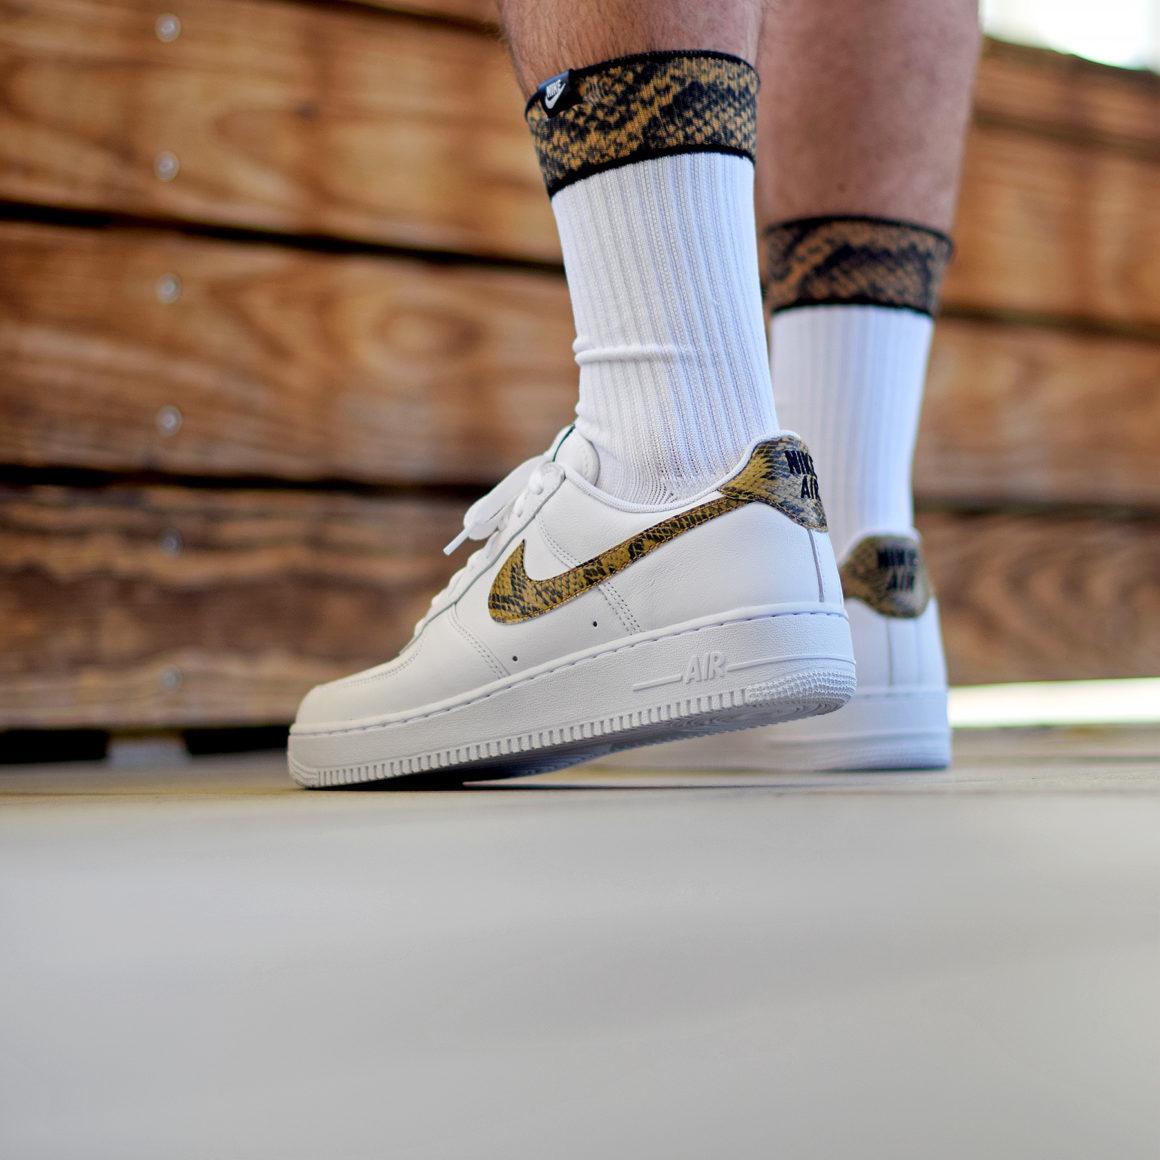 Nike Air Force Low 1 Qs Premium dhrCxstQ